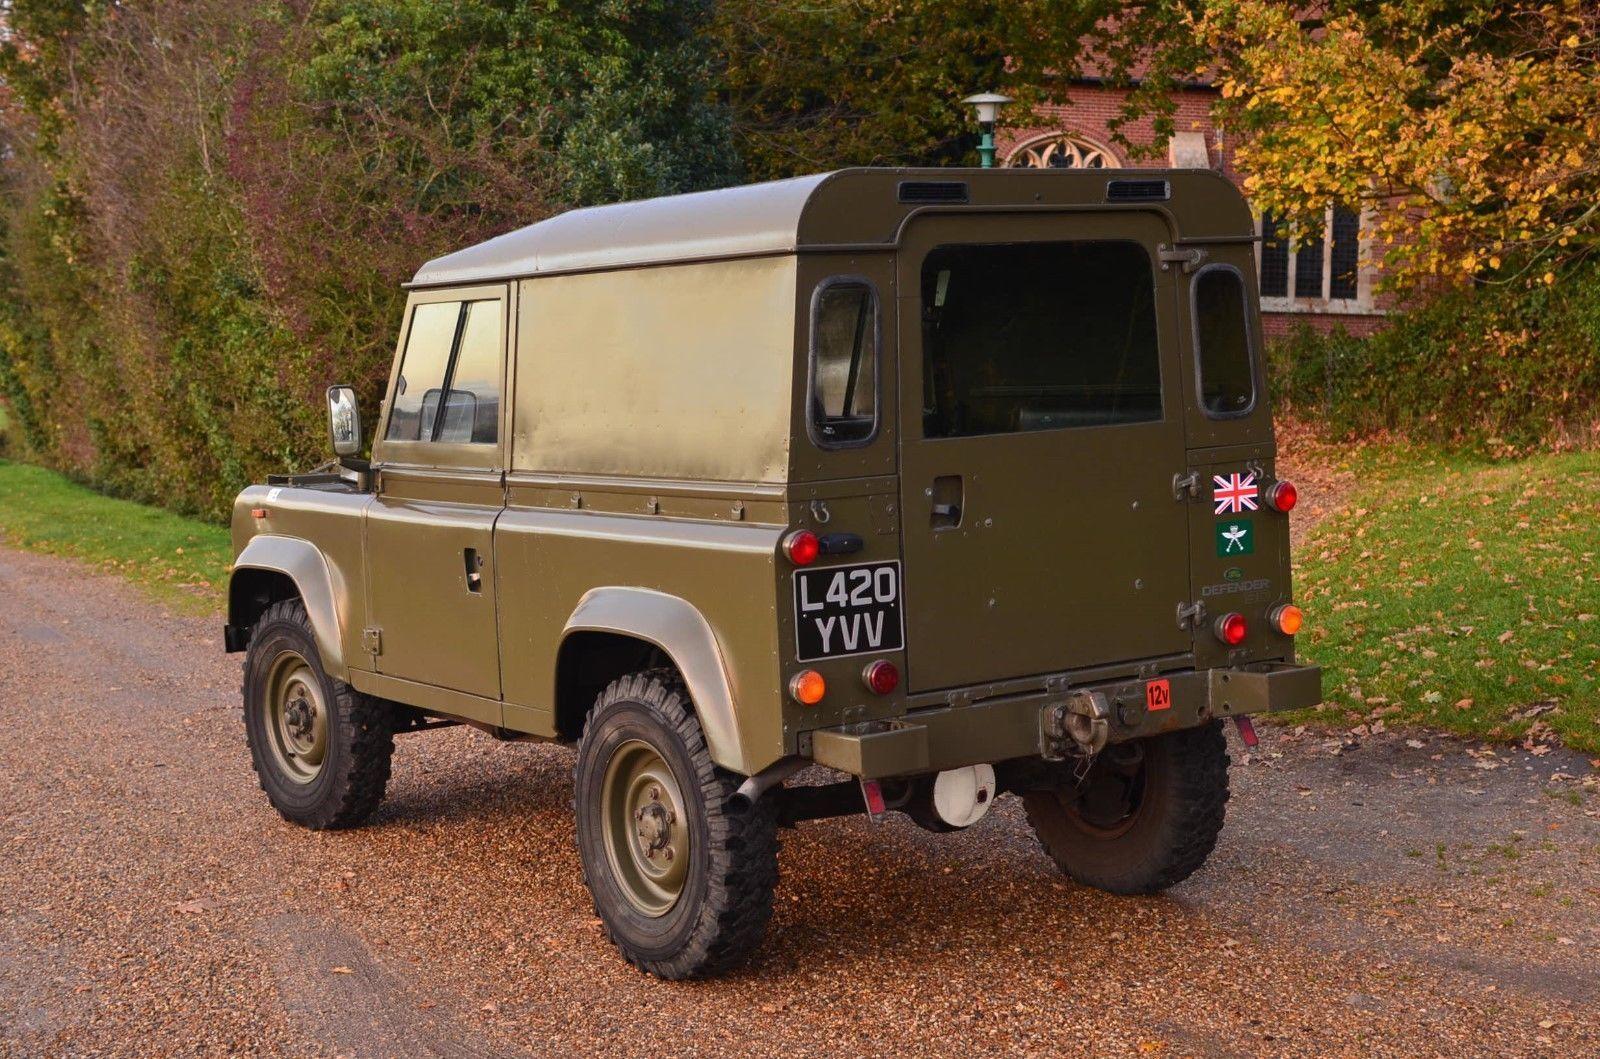 Land Rover Defender 90 Ex Gurkha Army Mod Military Excellent